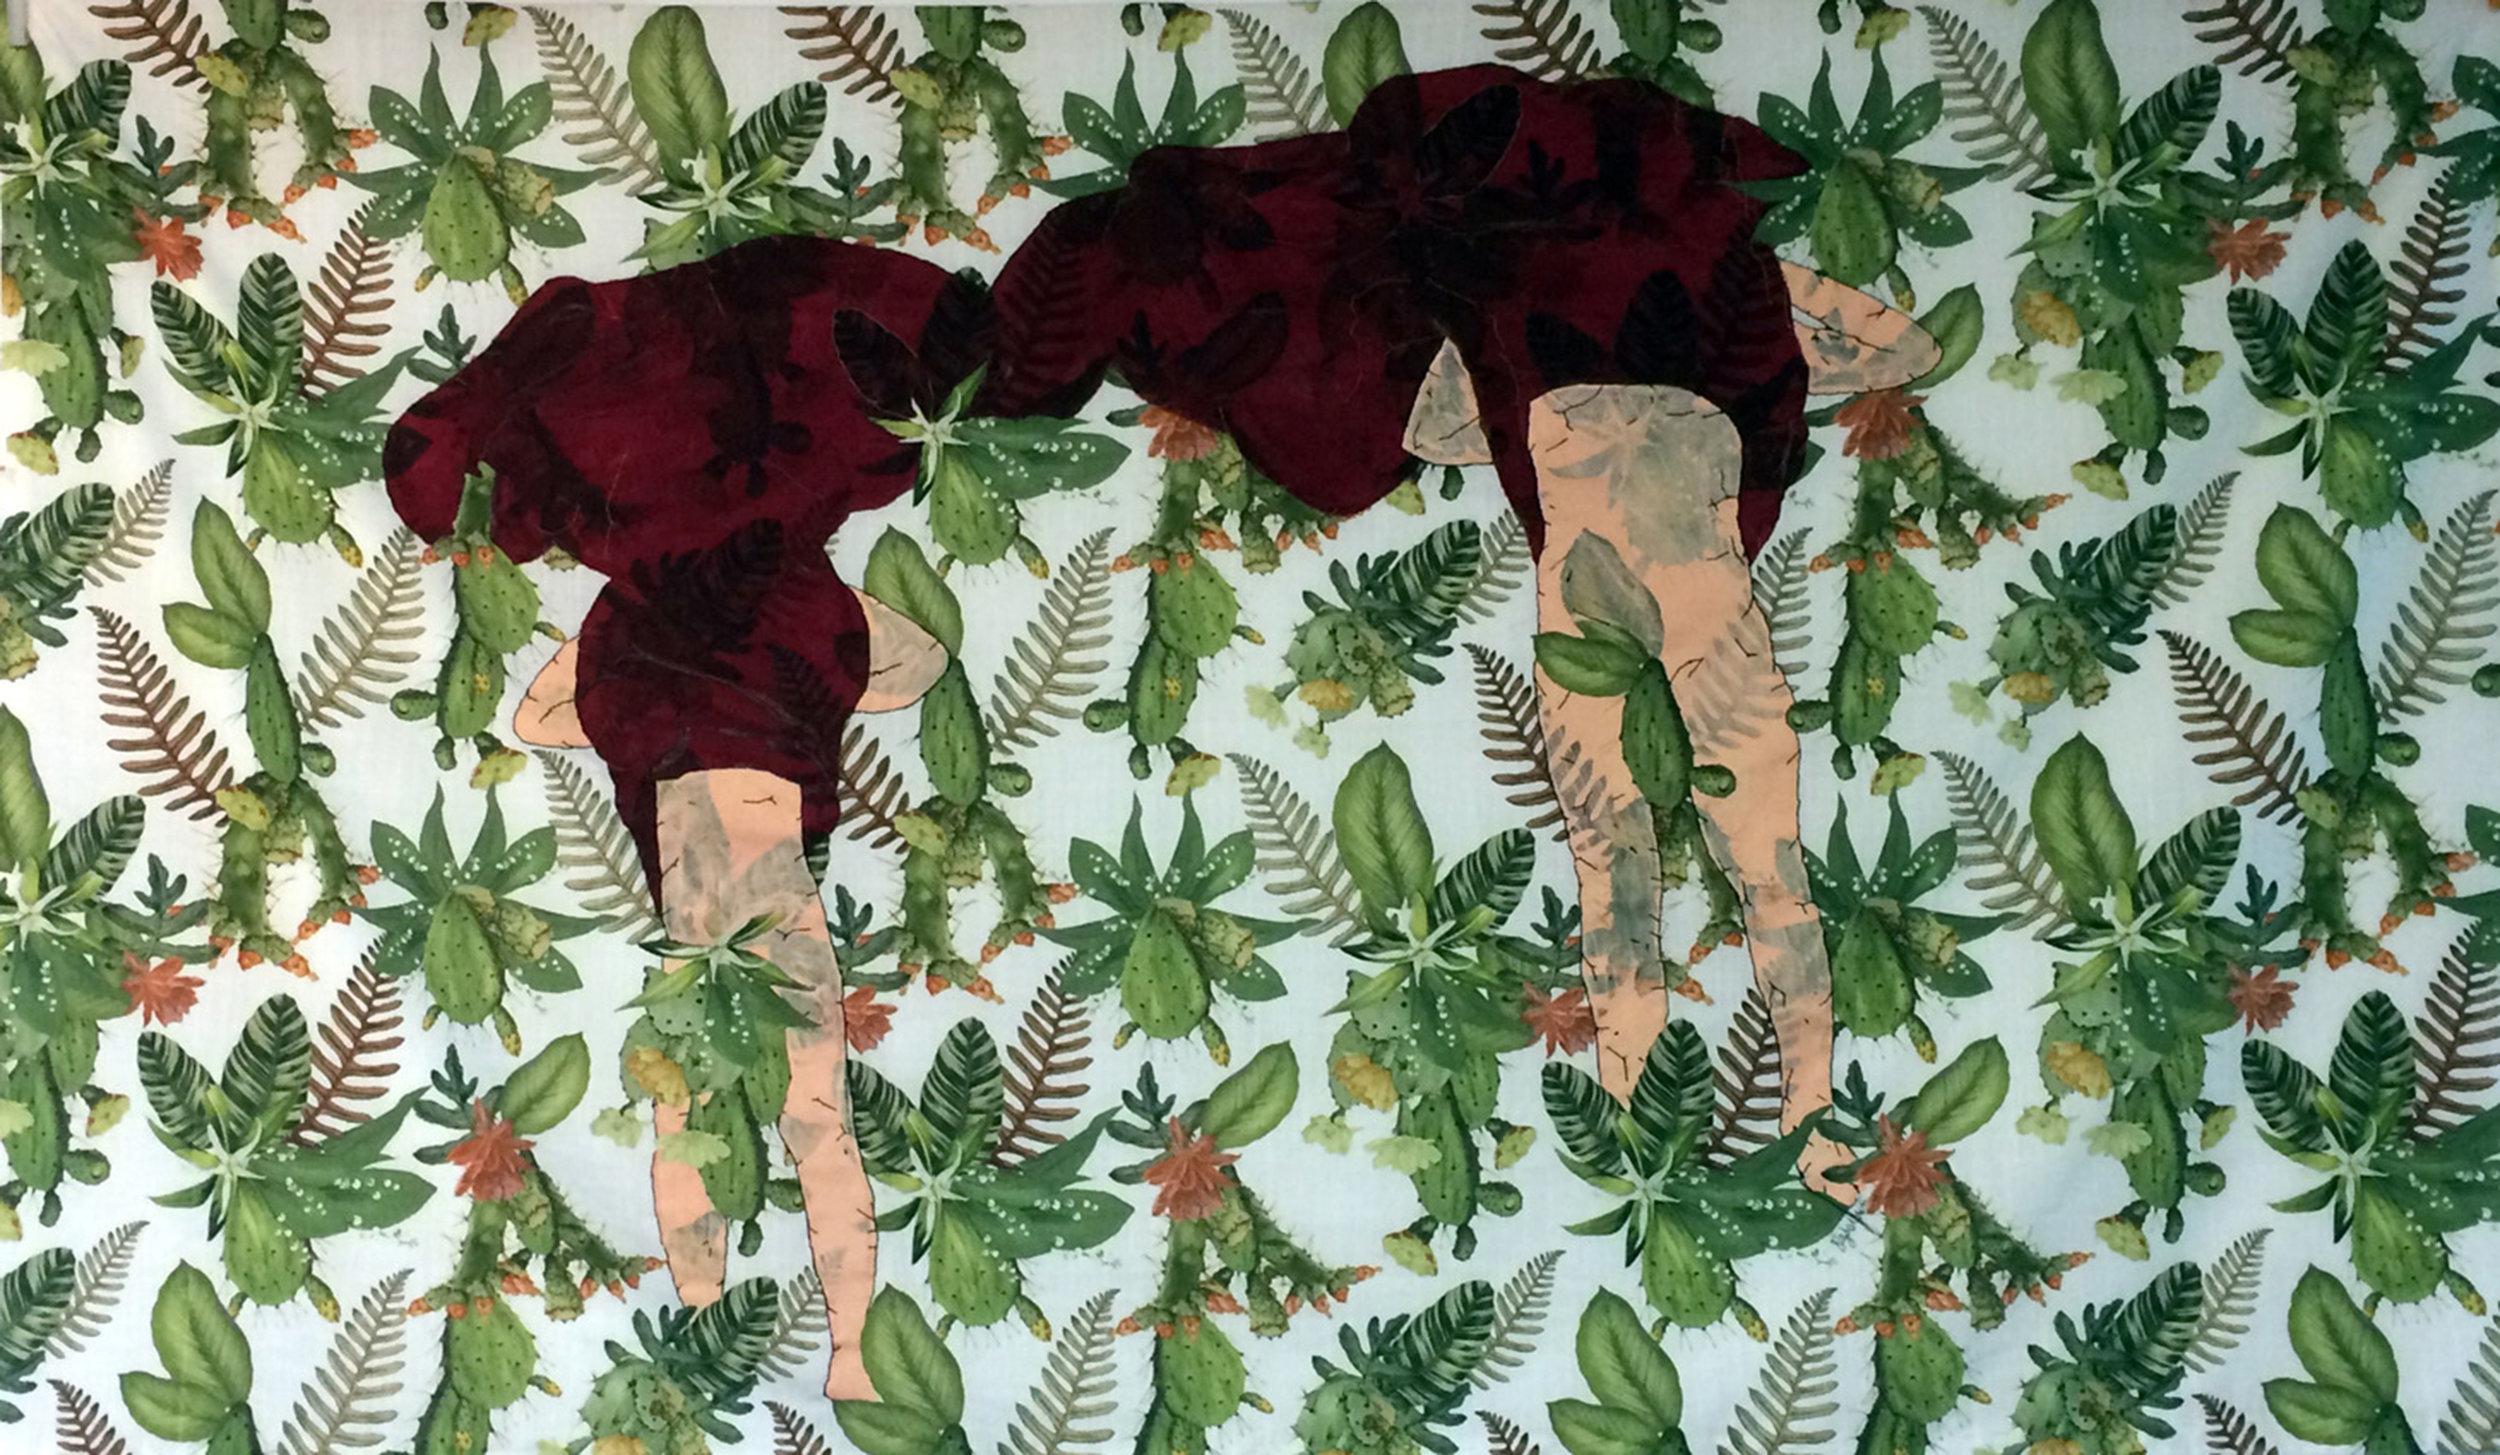 Perfect Match, 2018, Stitching on found fabric, 88 x 148 cm.